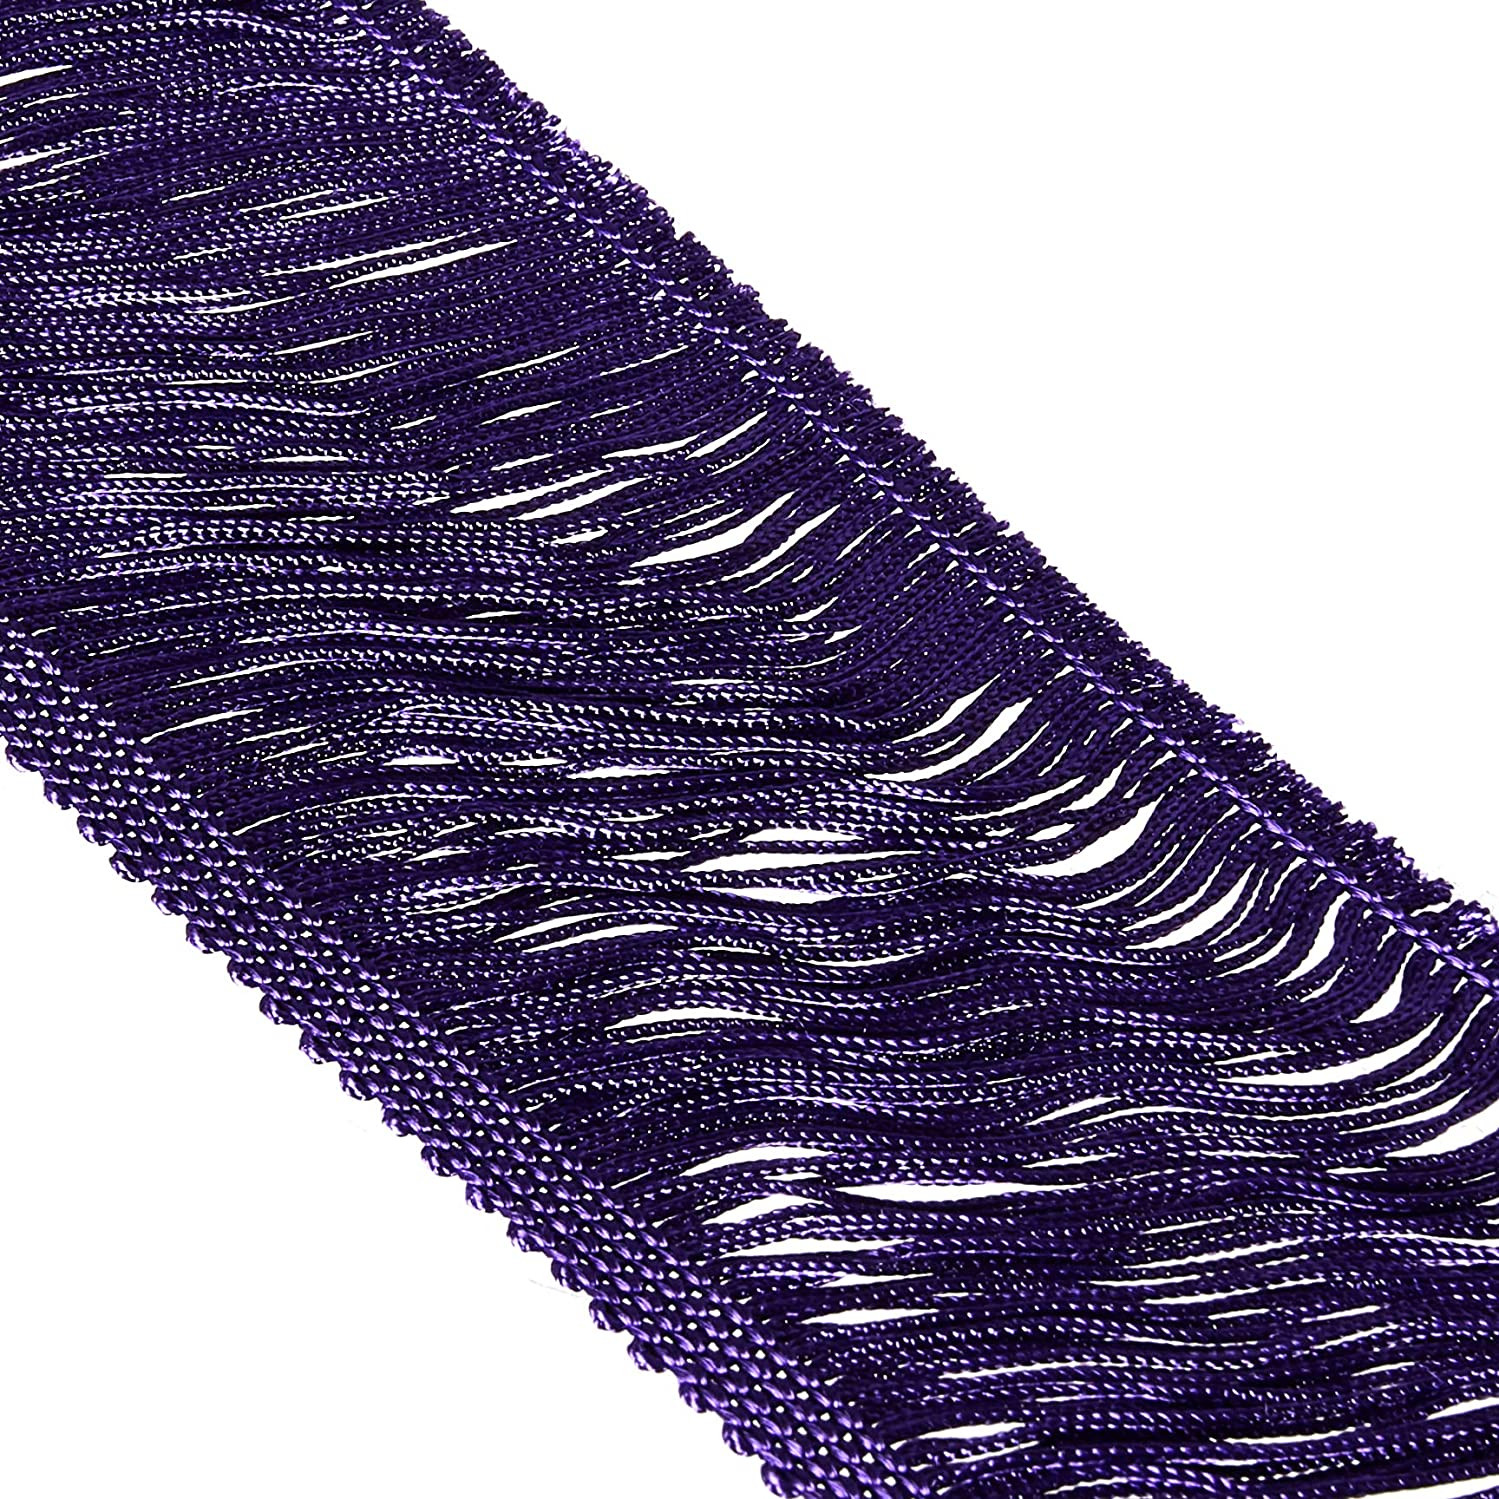 Decorative Trimmings Purple Chainette Fringe Trim 4